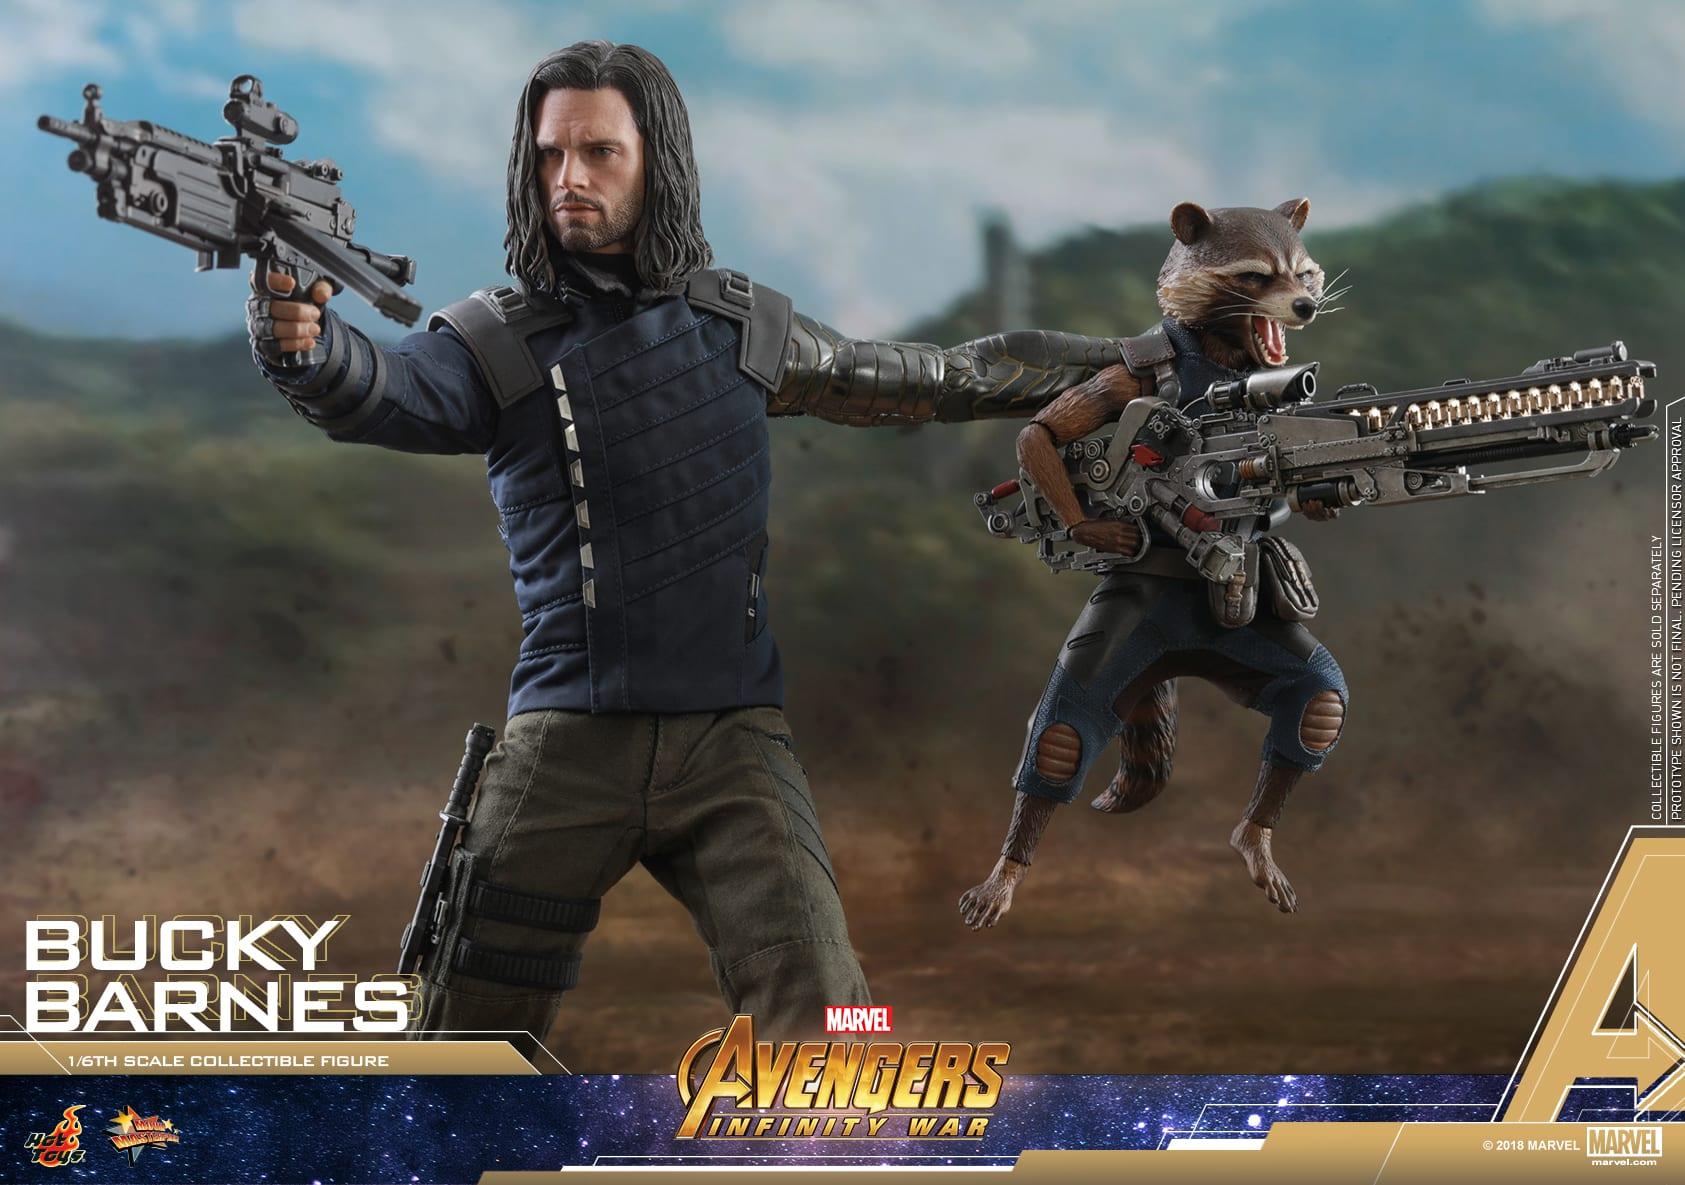 Bucky Barnes obtiene una figura de la serie Masterpiece de la película Avengers: Infinity War de Hot Toys